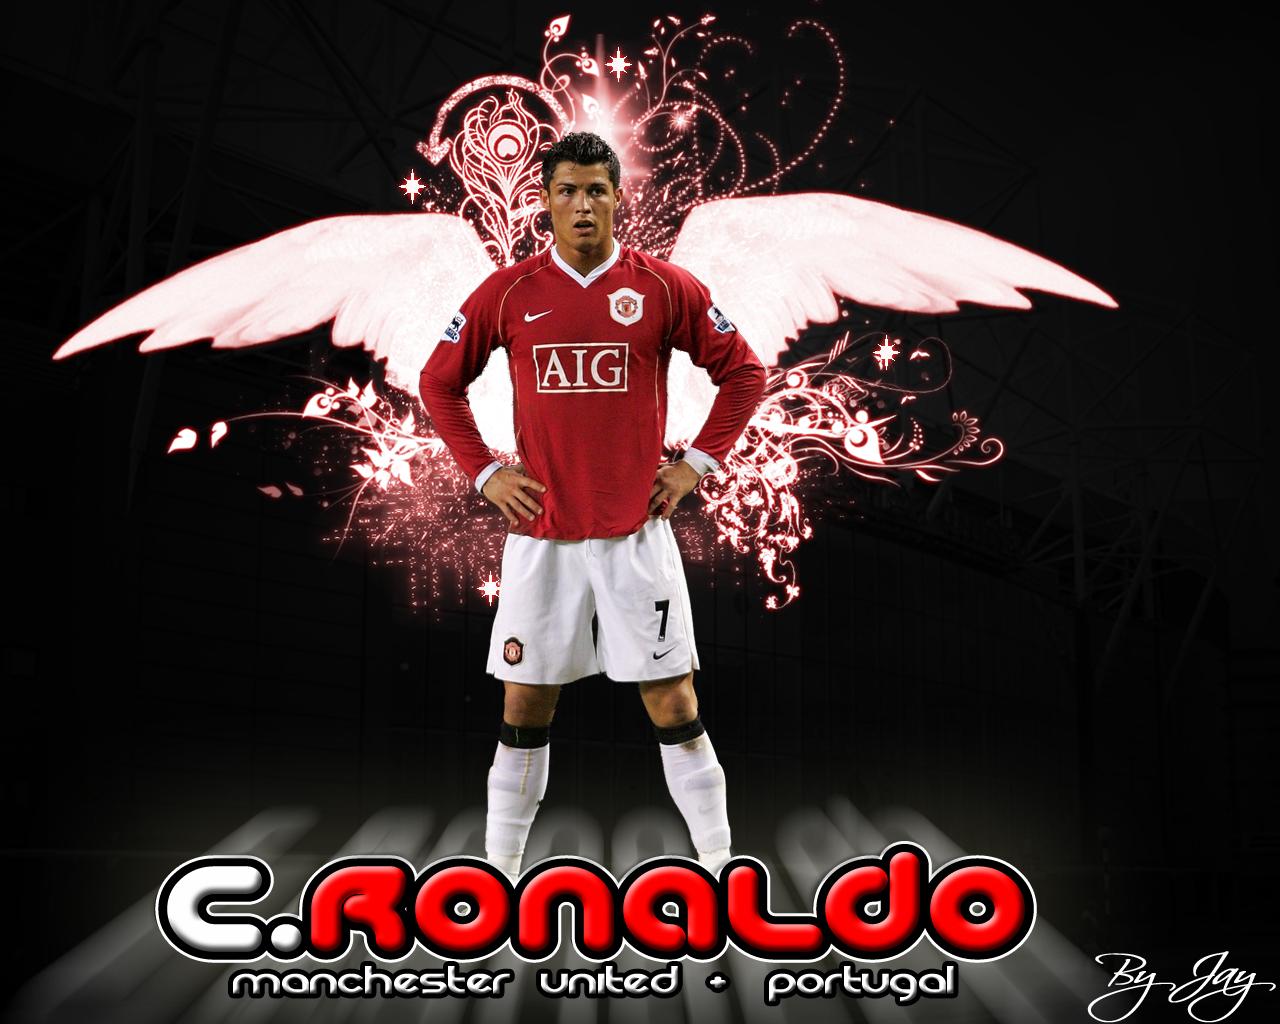 Football: Cristiano Ronaldo HD Wallpaper